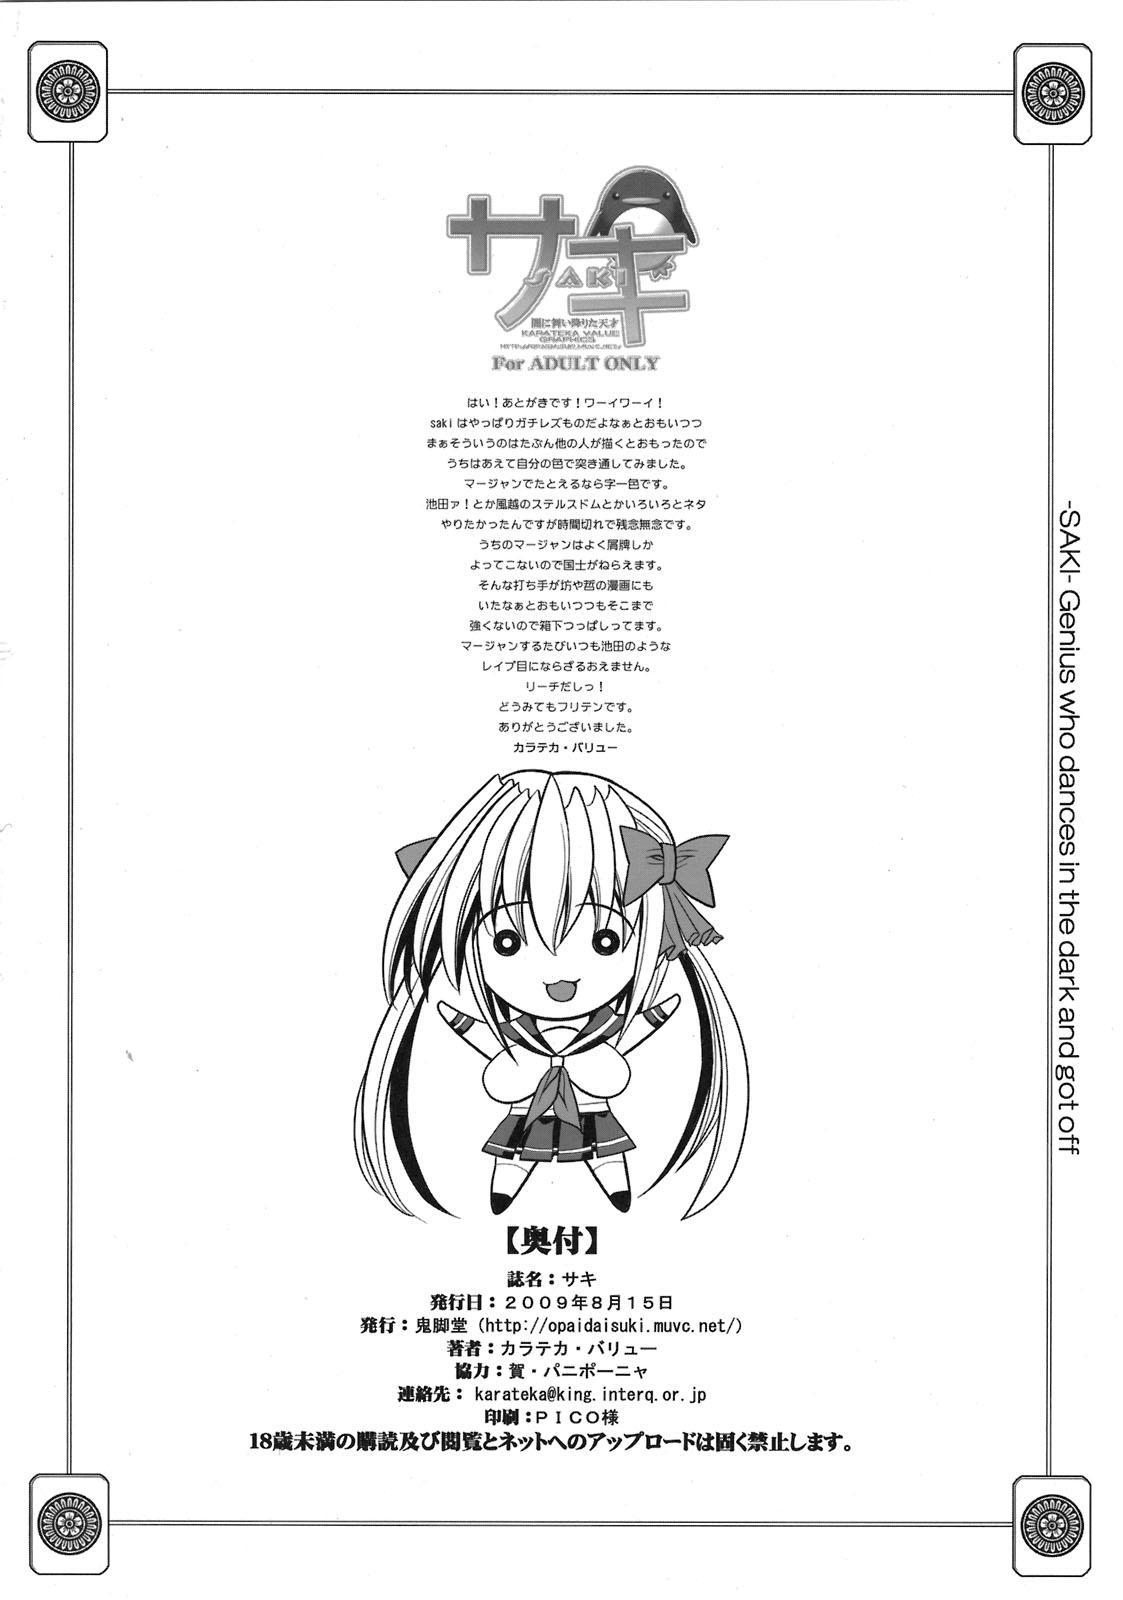 (C76) [Kikyakudou (Karateka VALUE)] Saki -Yami ni Maiorita Tensai-   Saki - The Genius Who Descended Into Darkness (Saki) [English] [EHCOVE] 25